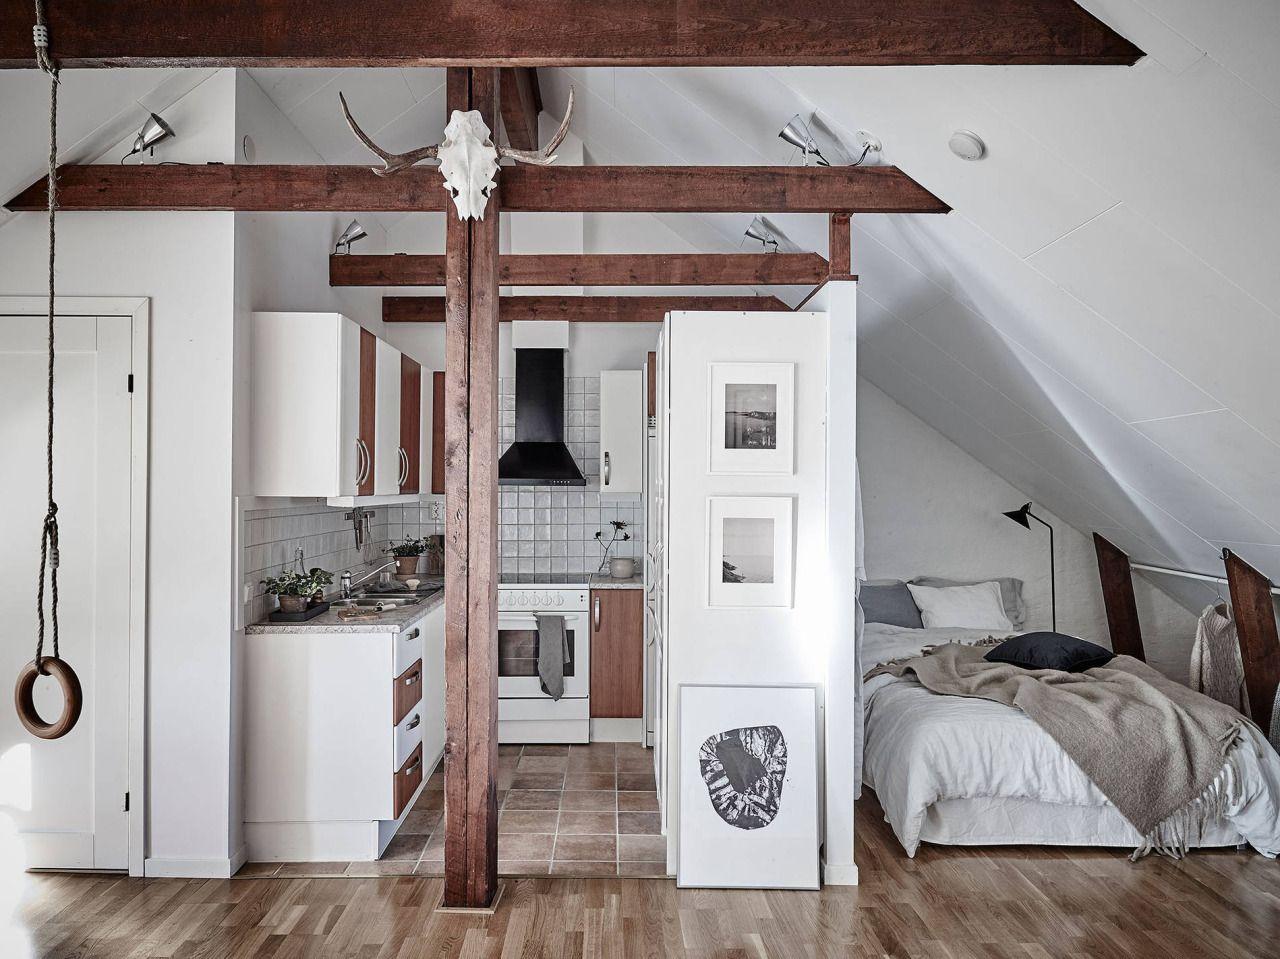 Attic Studio Apartment Photos By Jonas Berg Follow Gravity Home Blog Instagram Pinterest Facebook Apartment Design Attic Apartment Stylish Apartment